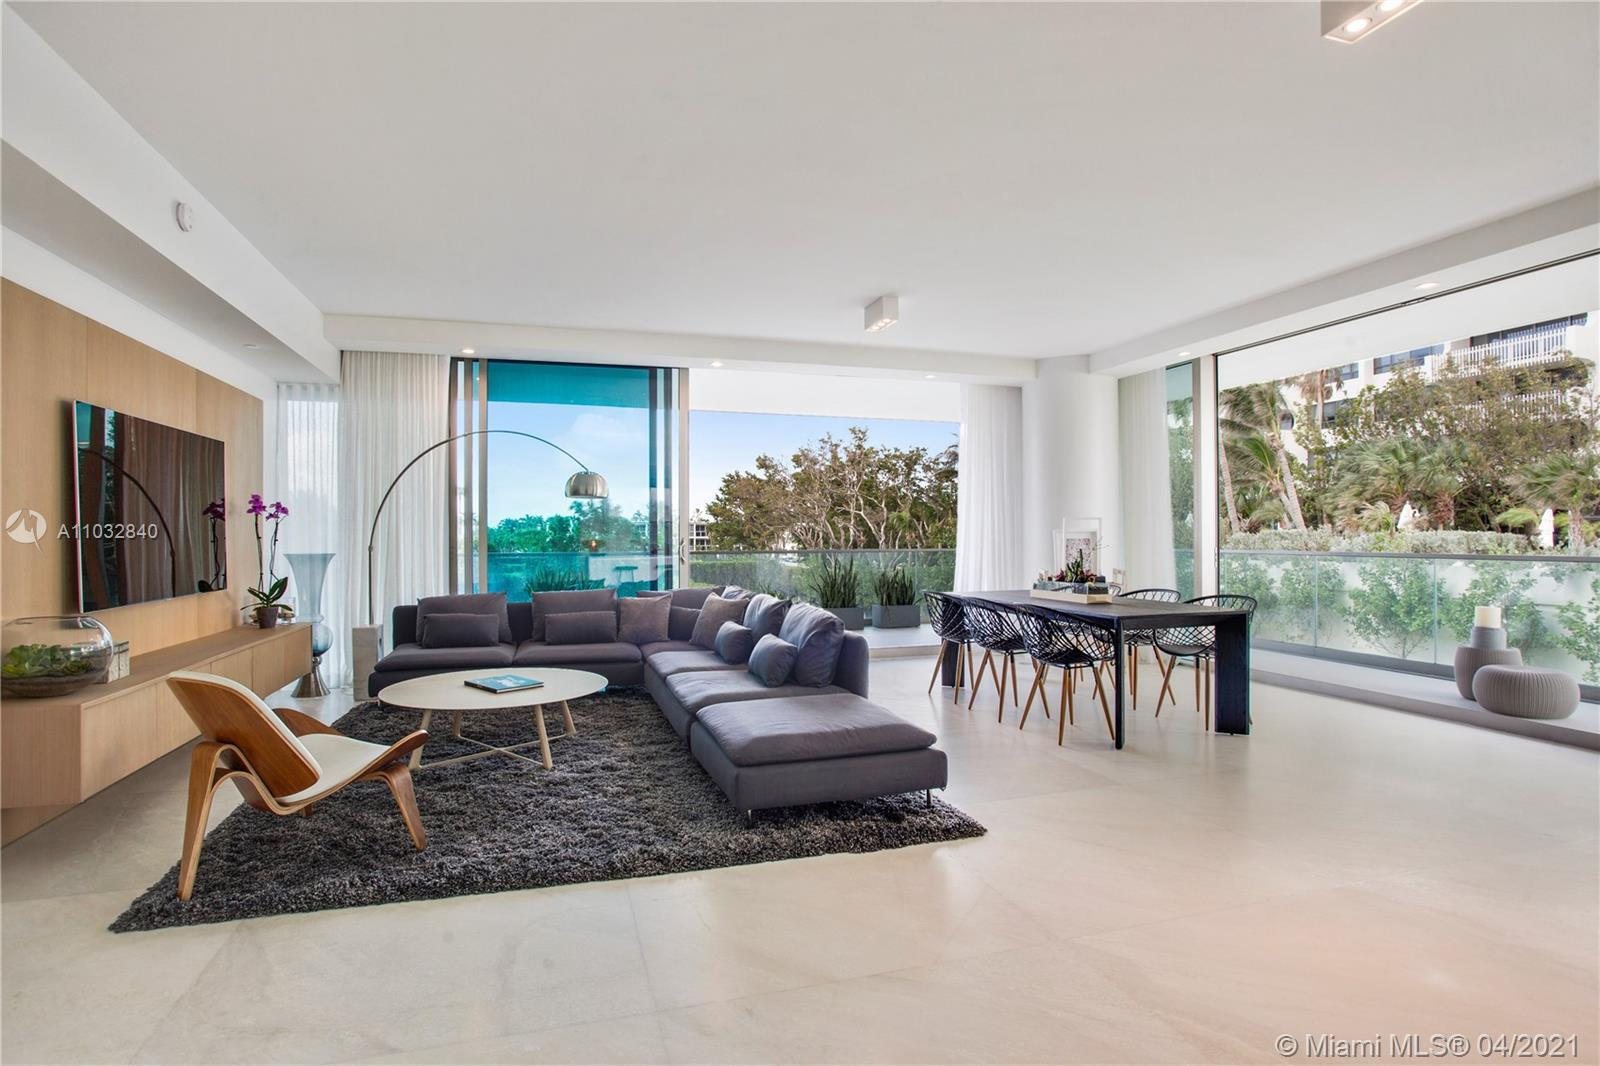 Stunning Turn Key 2 bedroom, 2 bathrooms fully furnished residence at the prestigious Oceana Bal Har